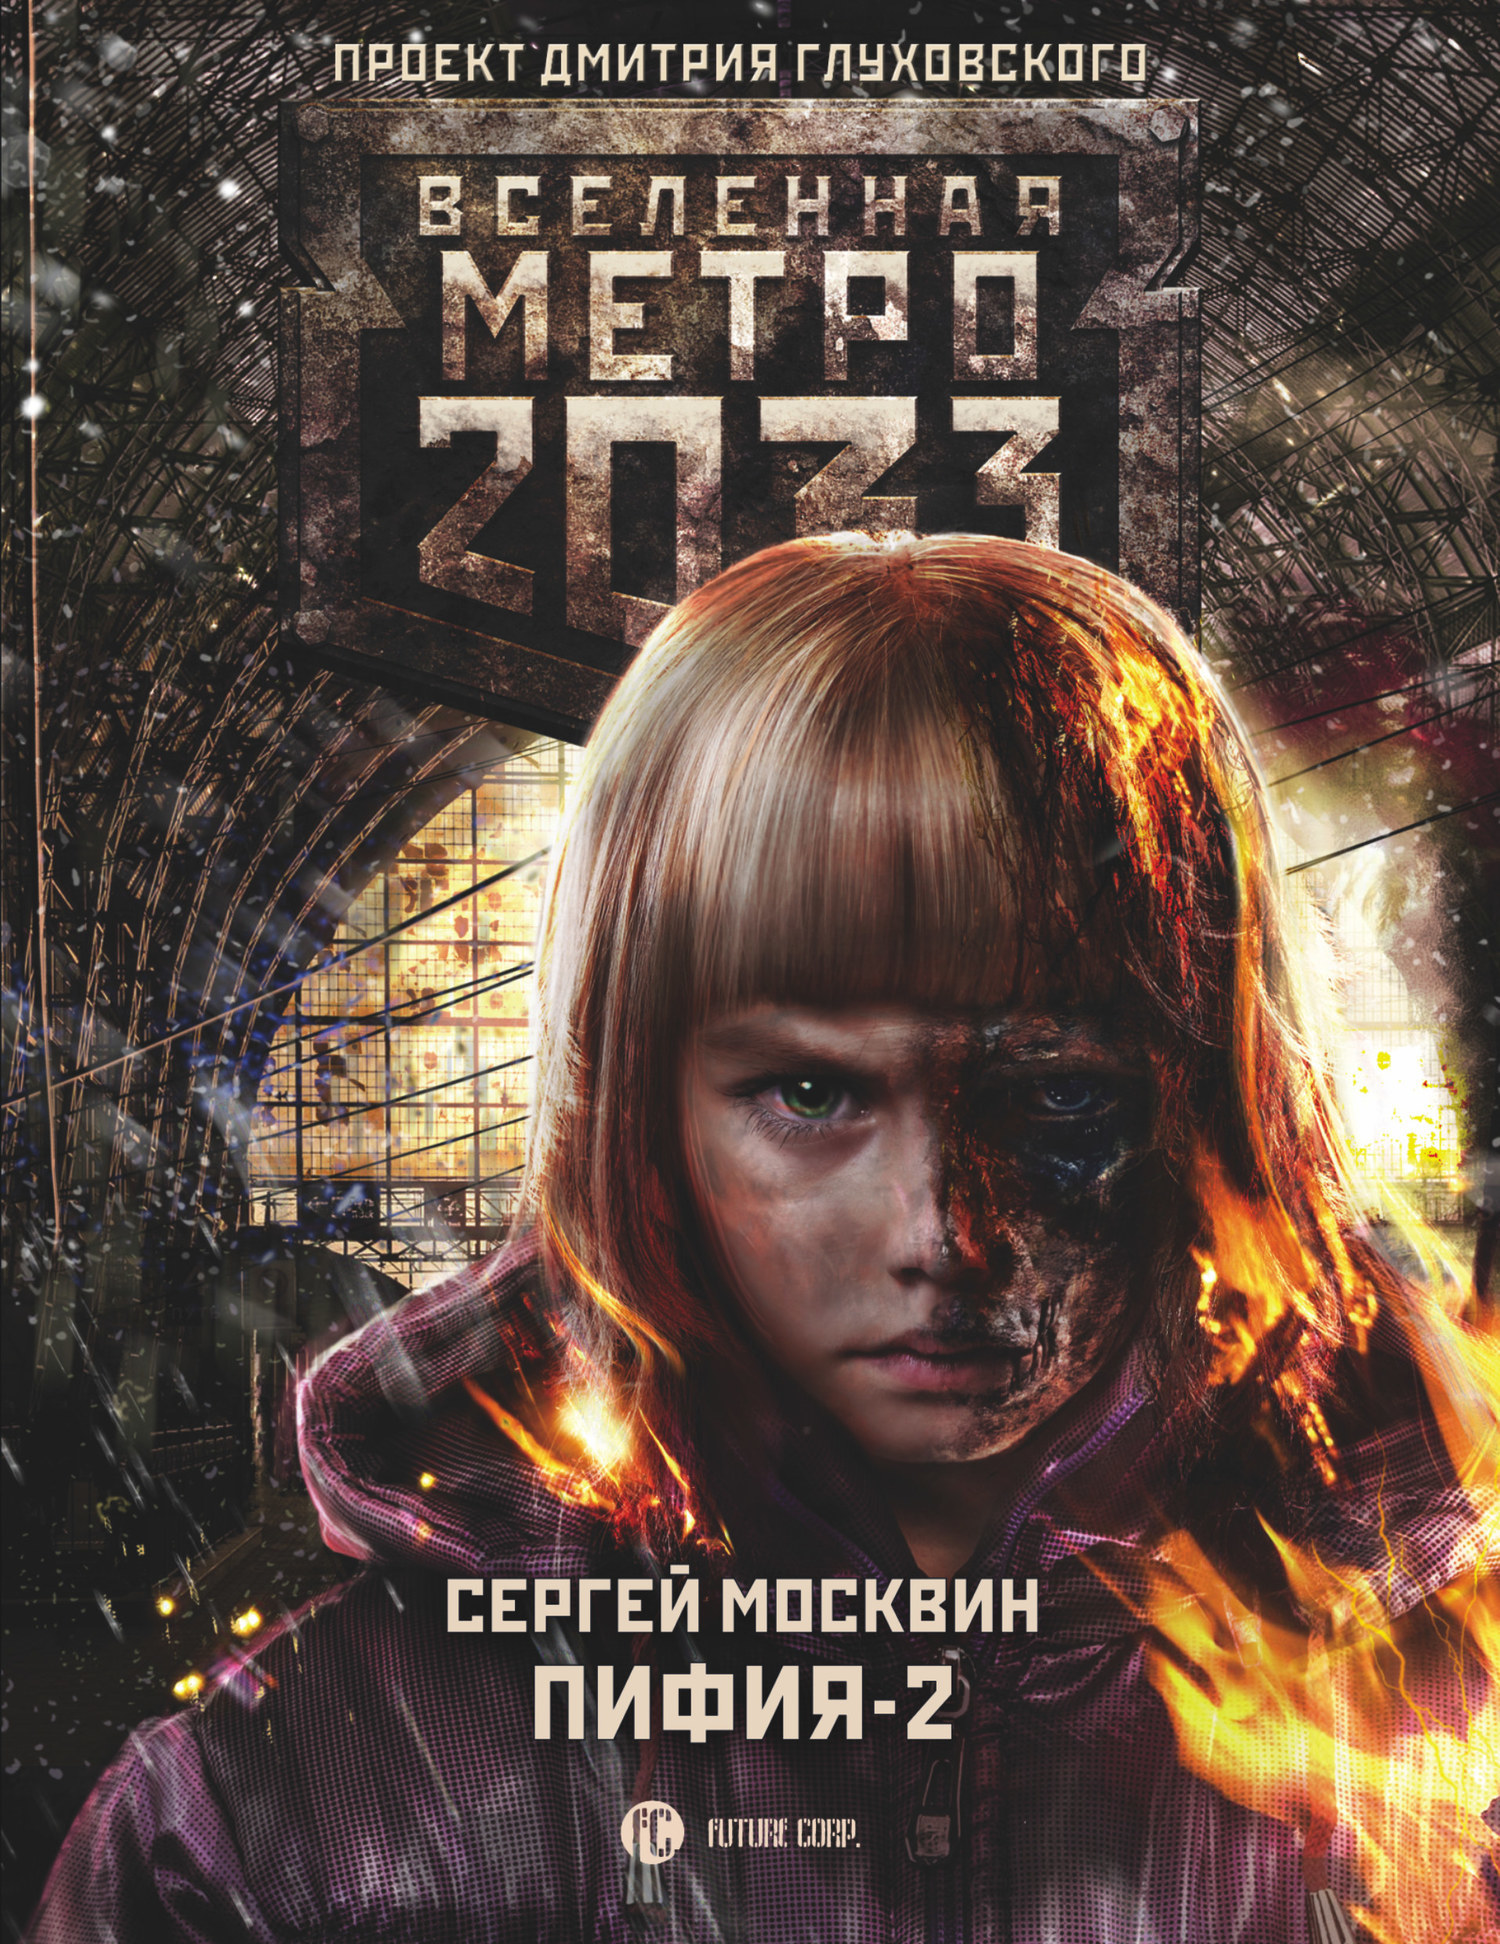 Сергей Москвин - Метро 2033: Пифия-2. В грязи и крови